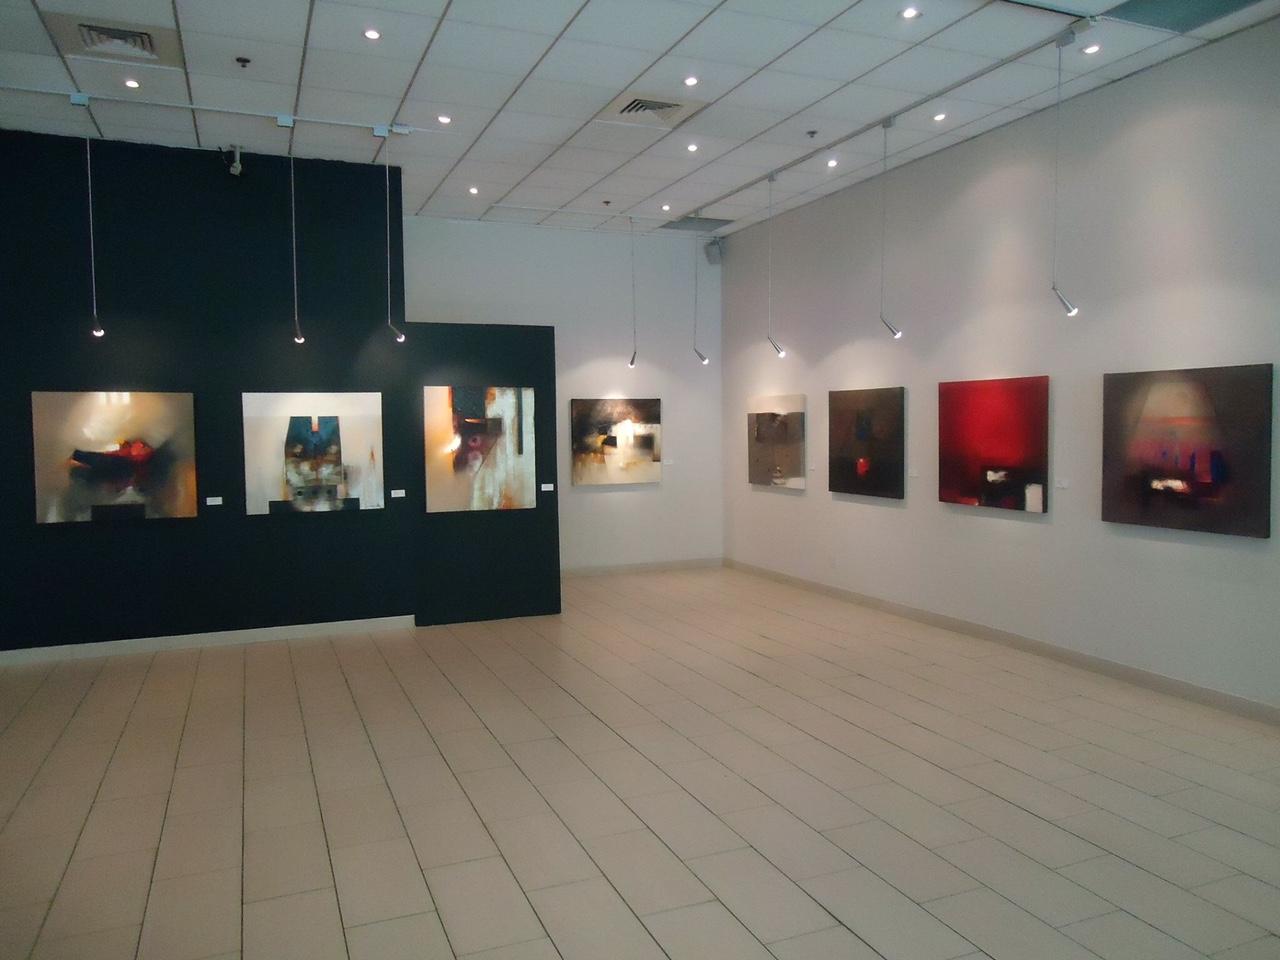 Galeria Oscar Roman